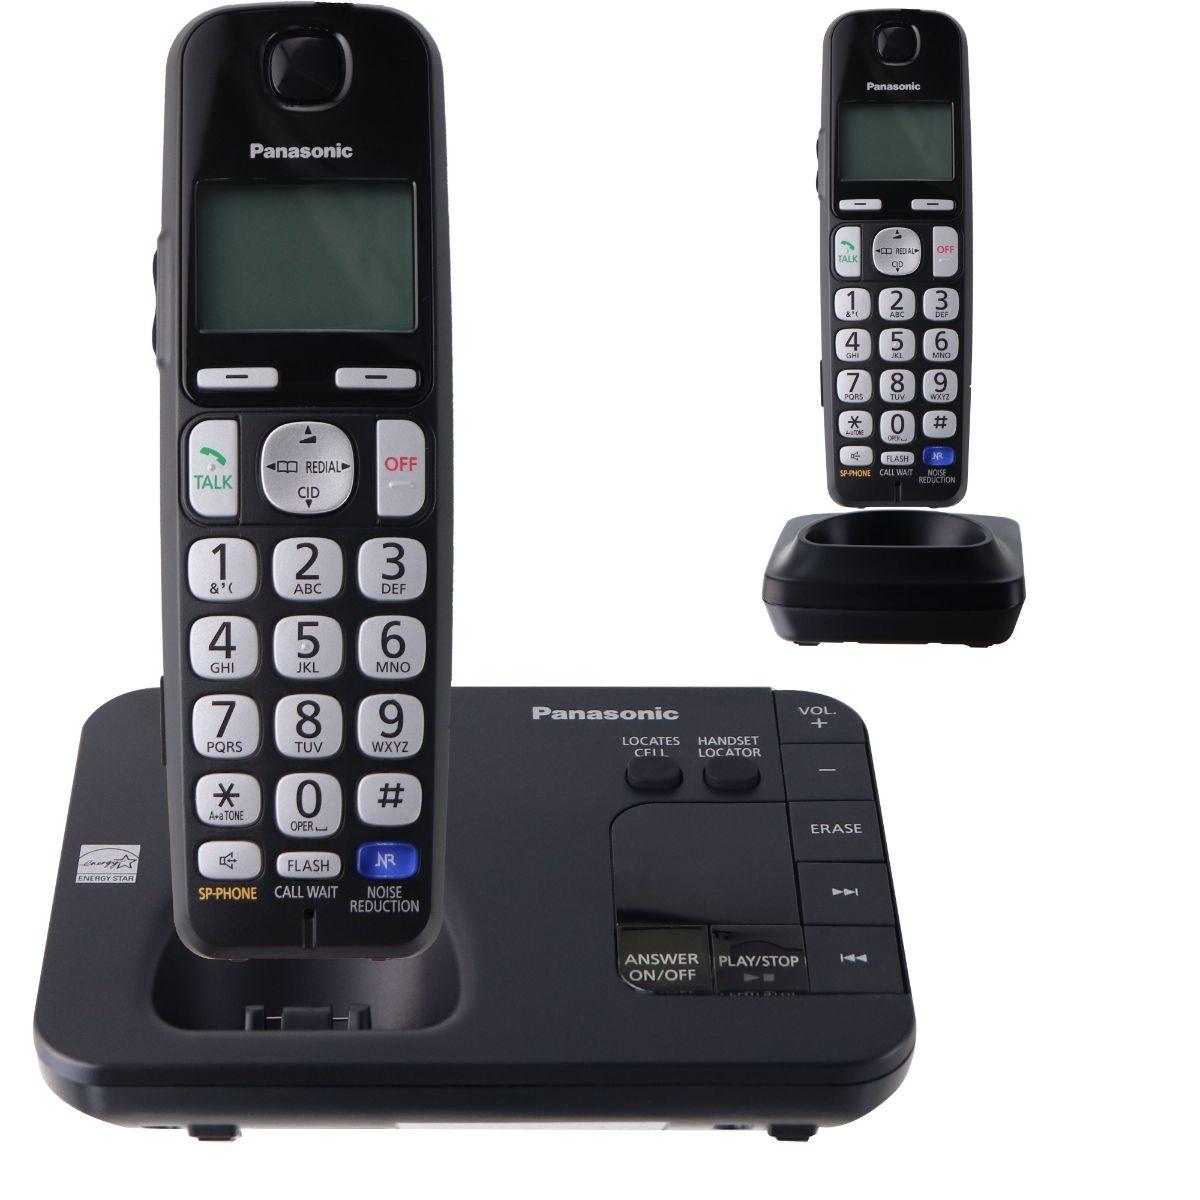 Panasonic KX-TGL432B Dect 6.0 2-Handset Landline Telephone - Black